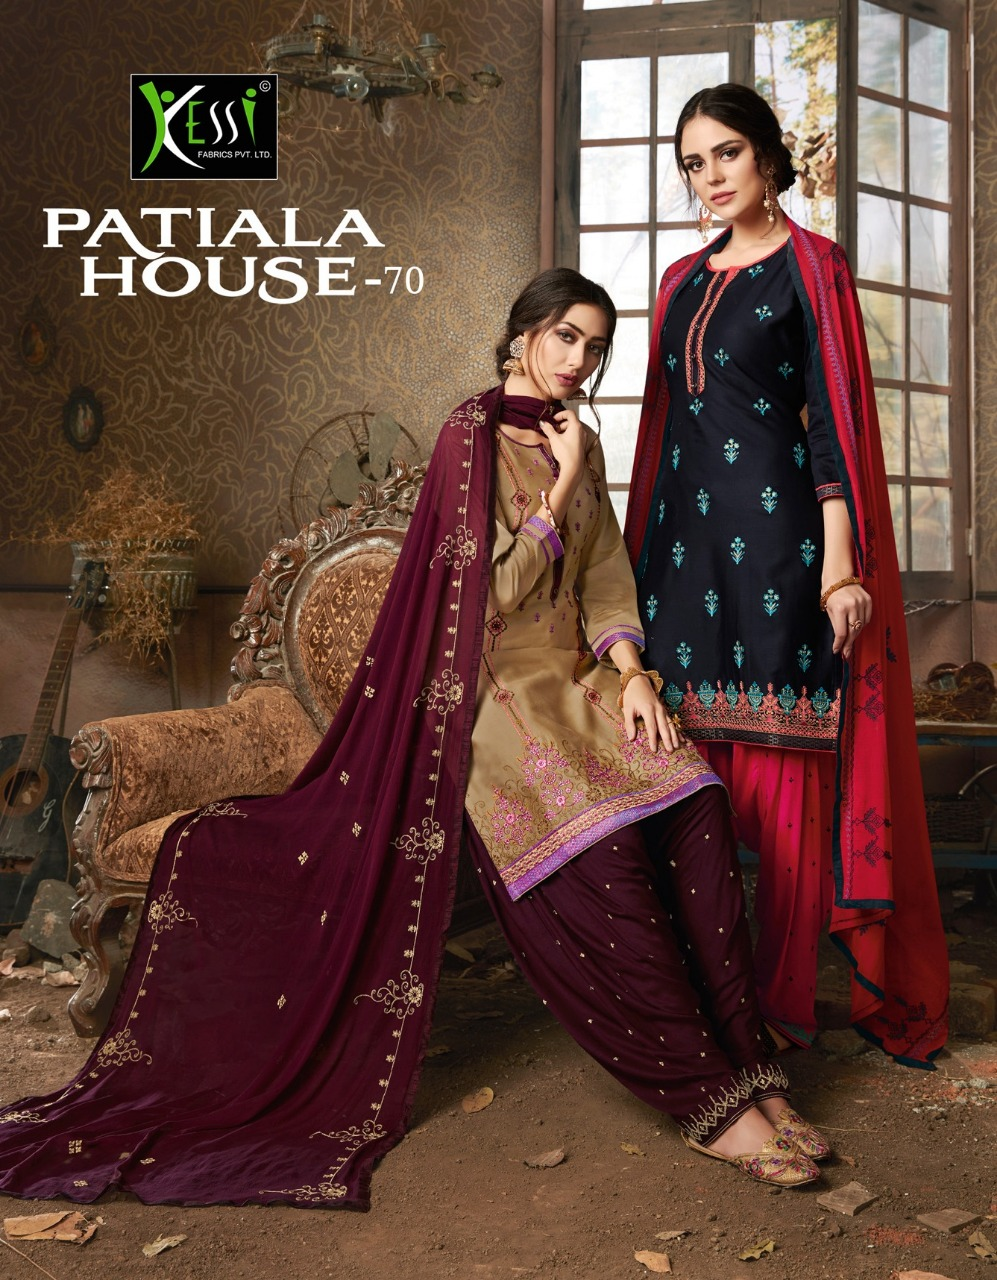 Kessi Fabric Patiyala House Vol 70 Designer Suit Wholesale.